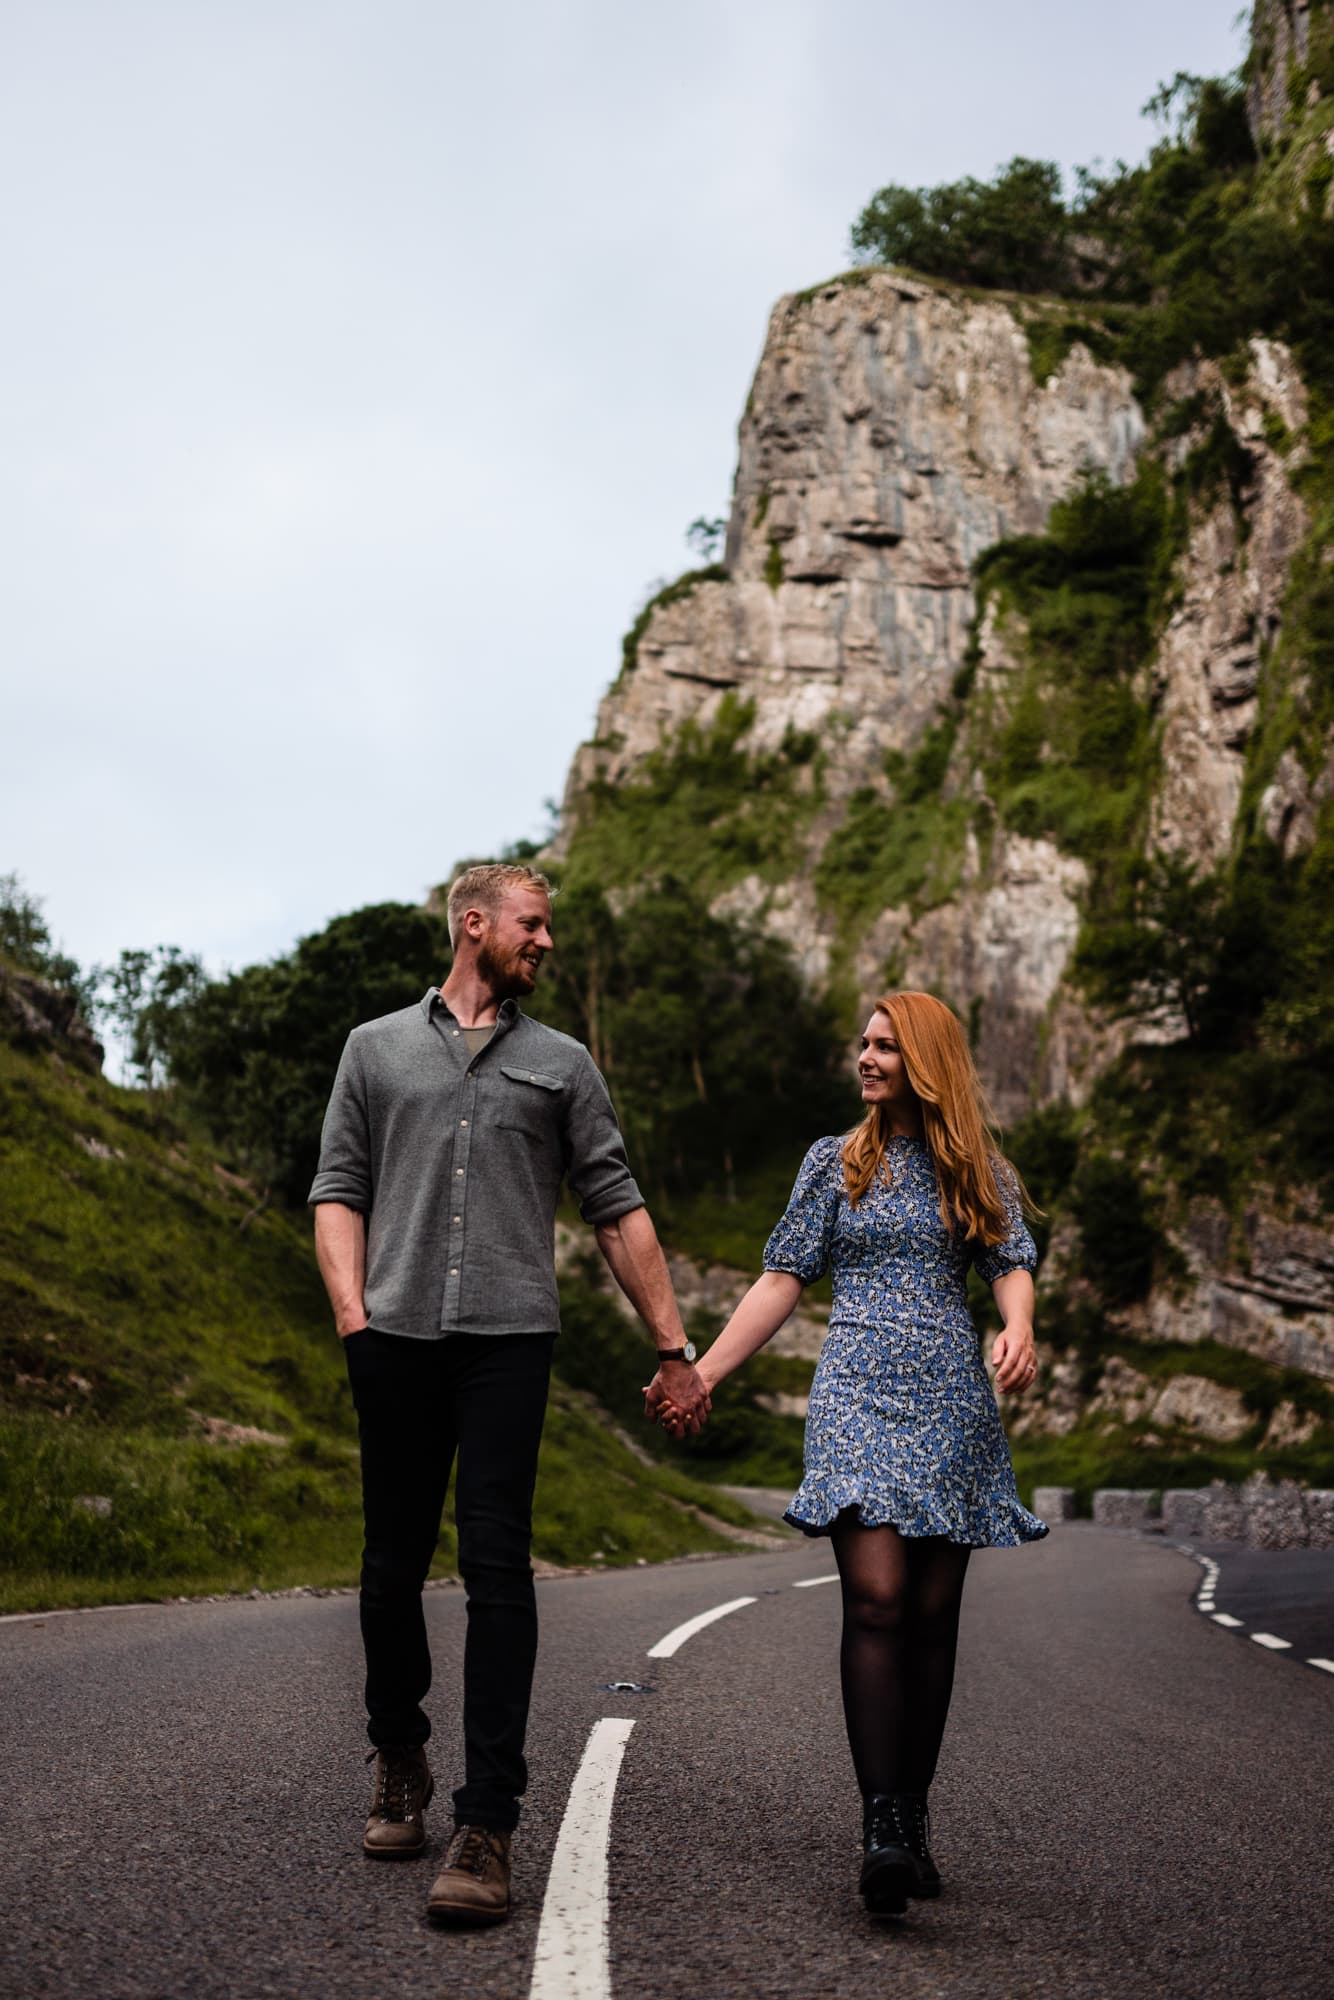 fun loving couple at cheddar gorge